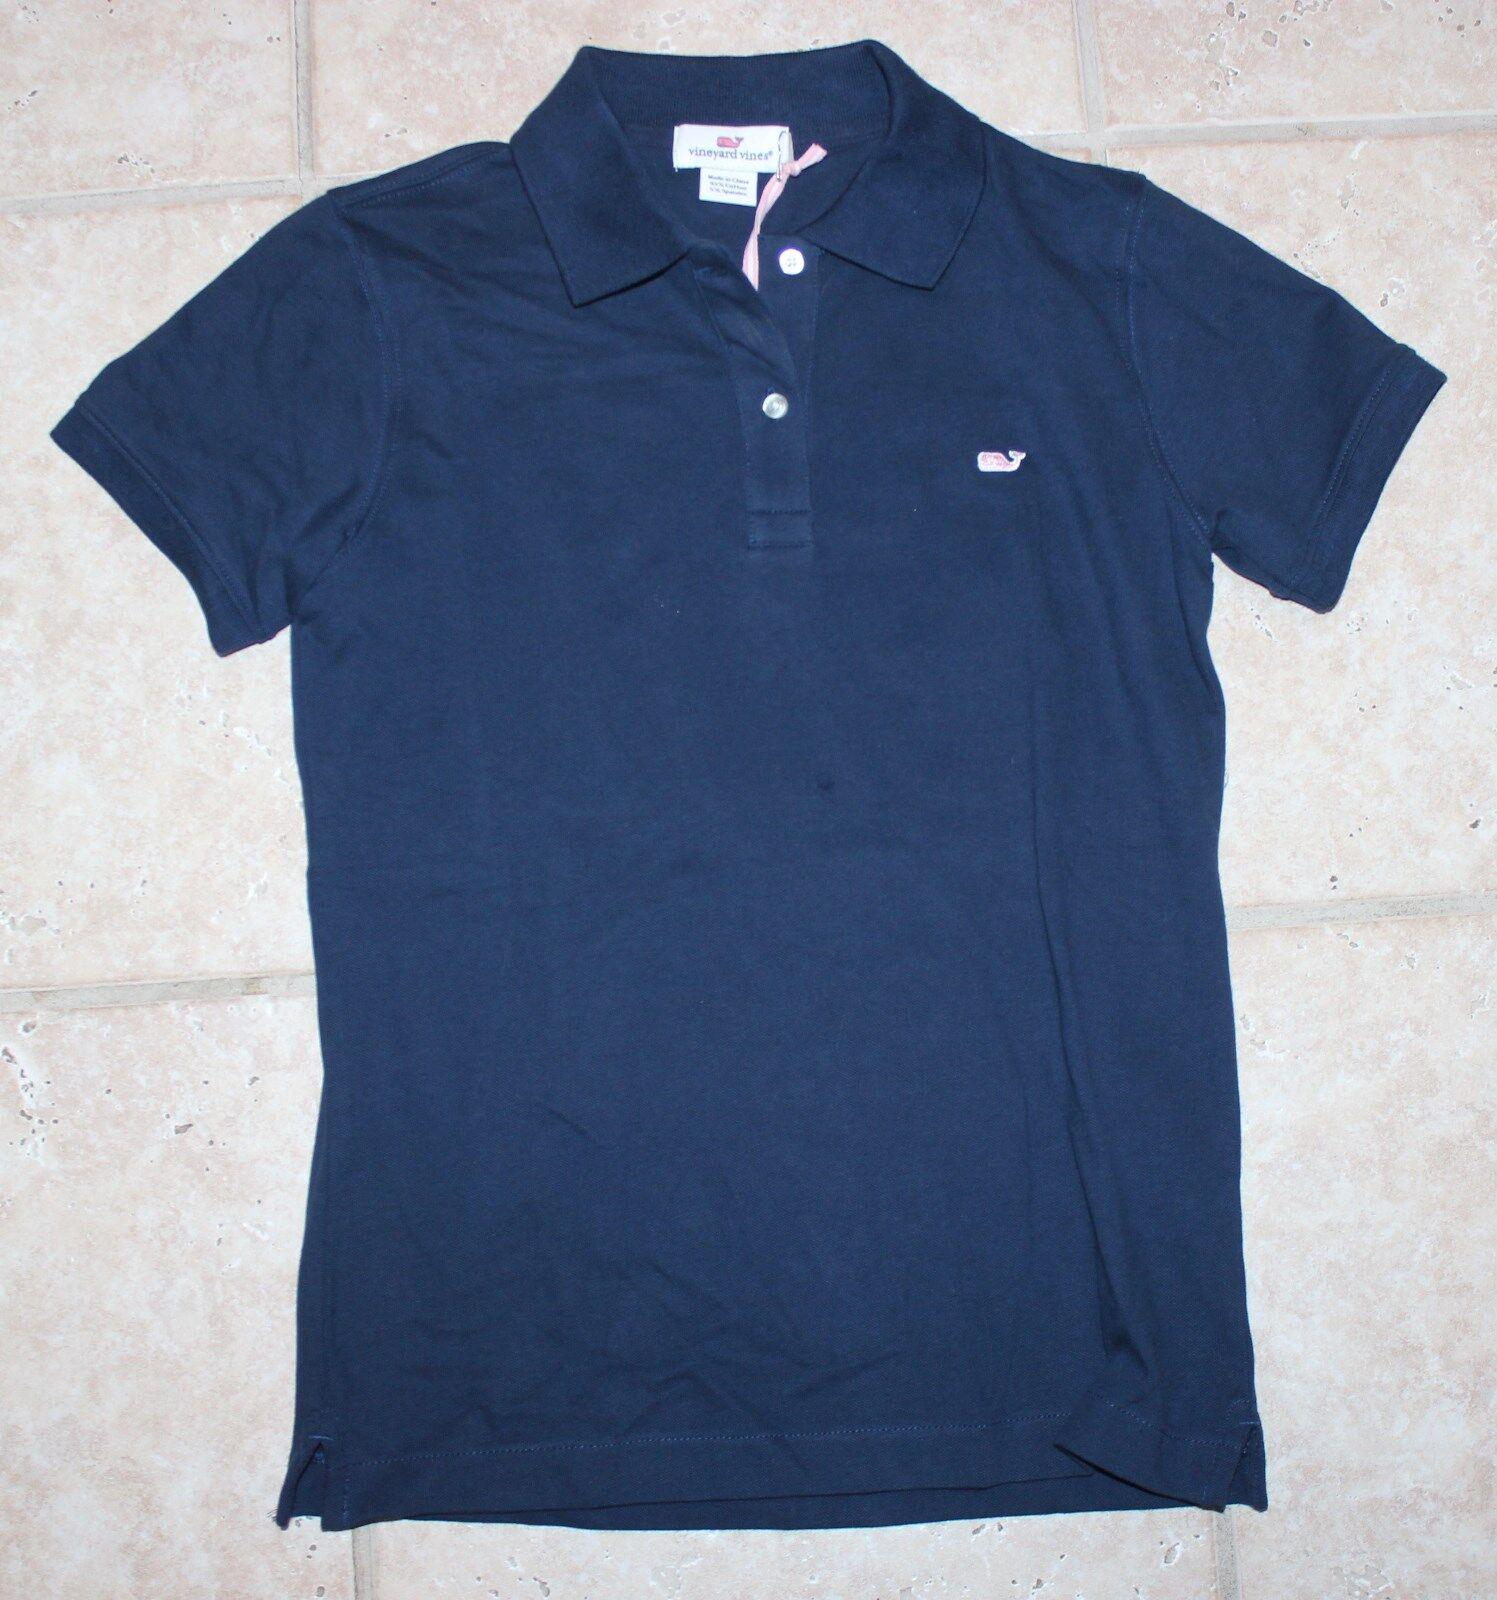 NWT Vineyard Vines damen Small Blau Blazer SS New Classic Solid Polo Shirt Top